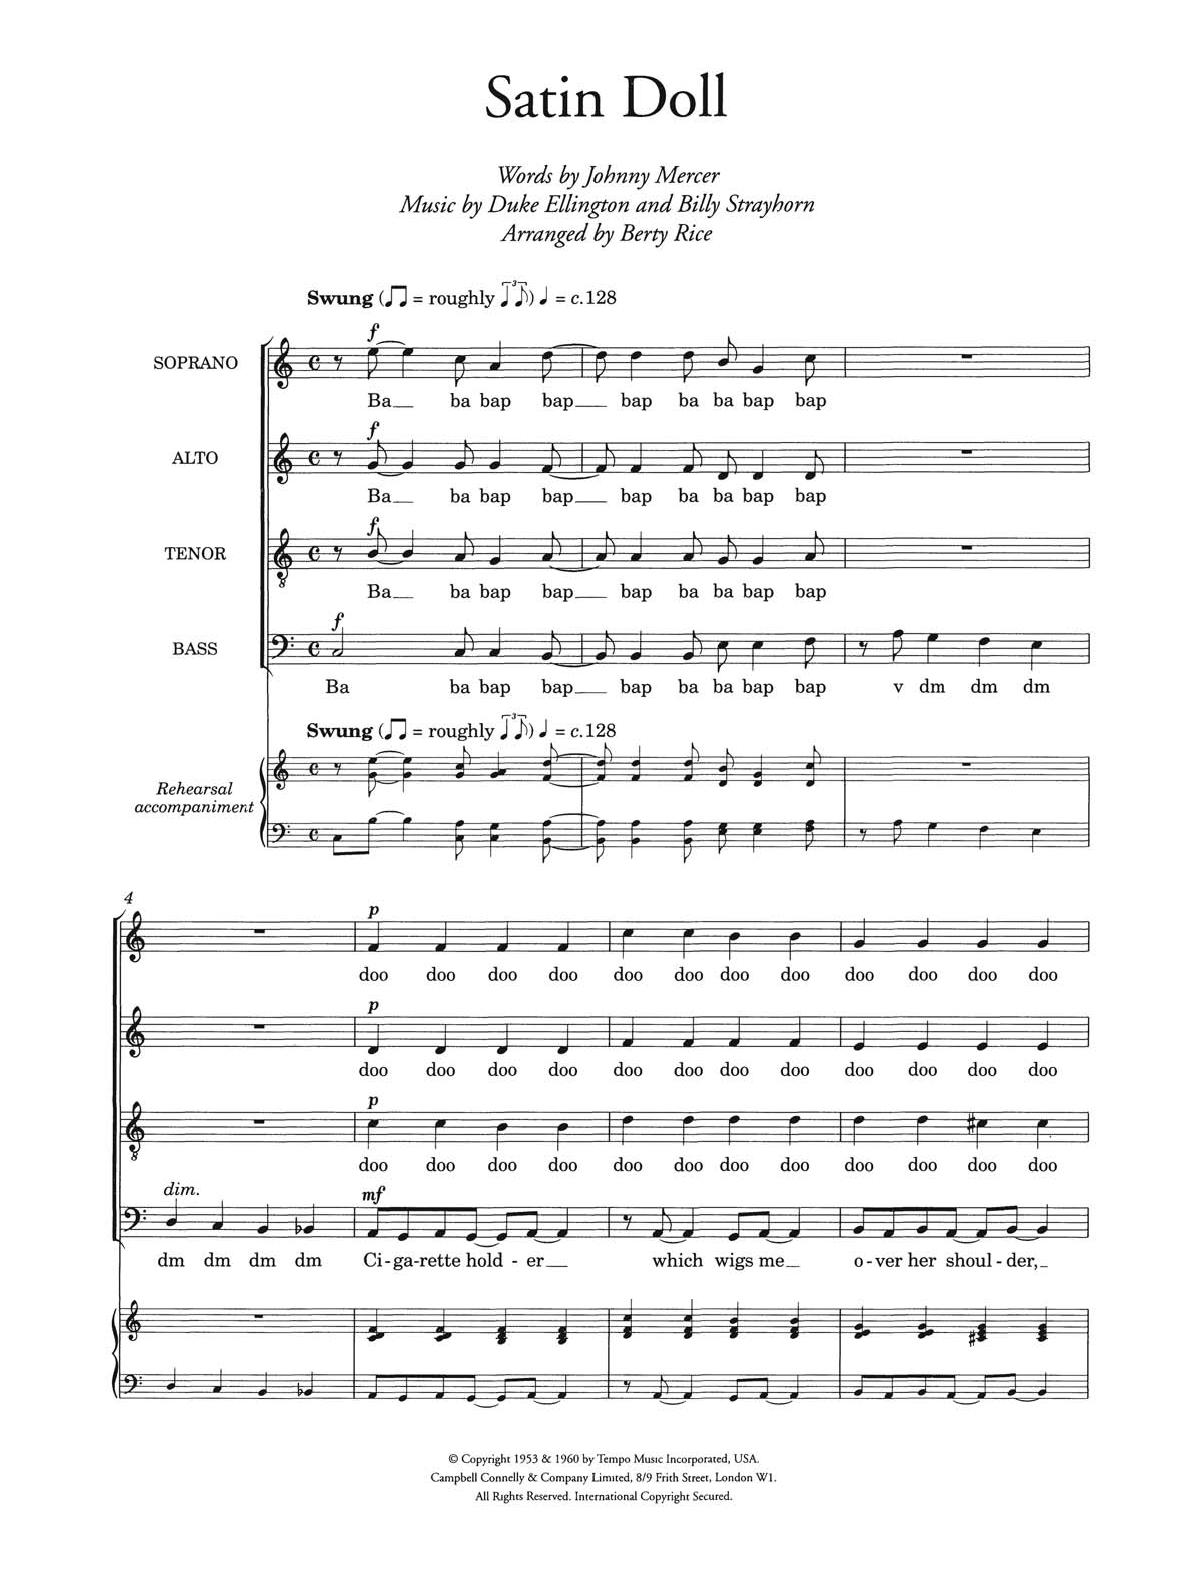 Duke Ellington - Satin Doll (arr. Berty Rice)